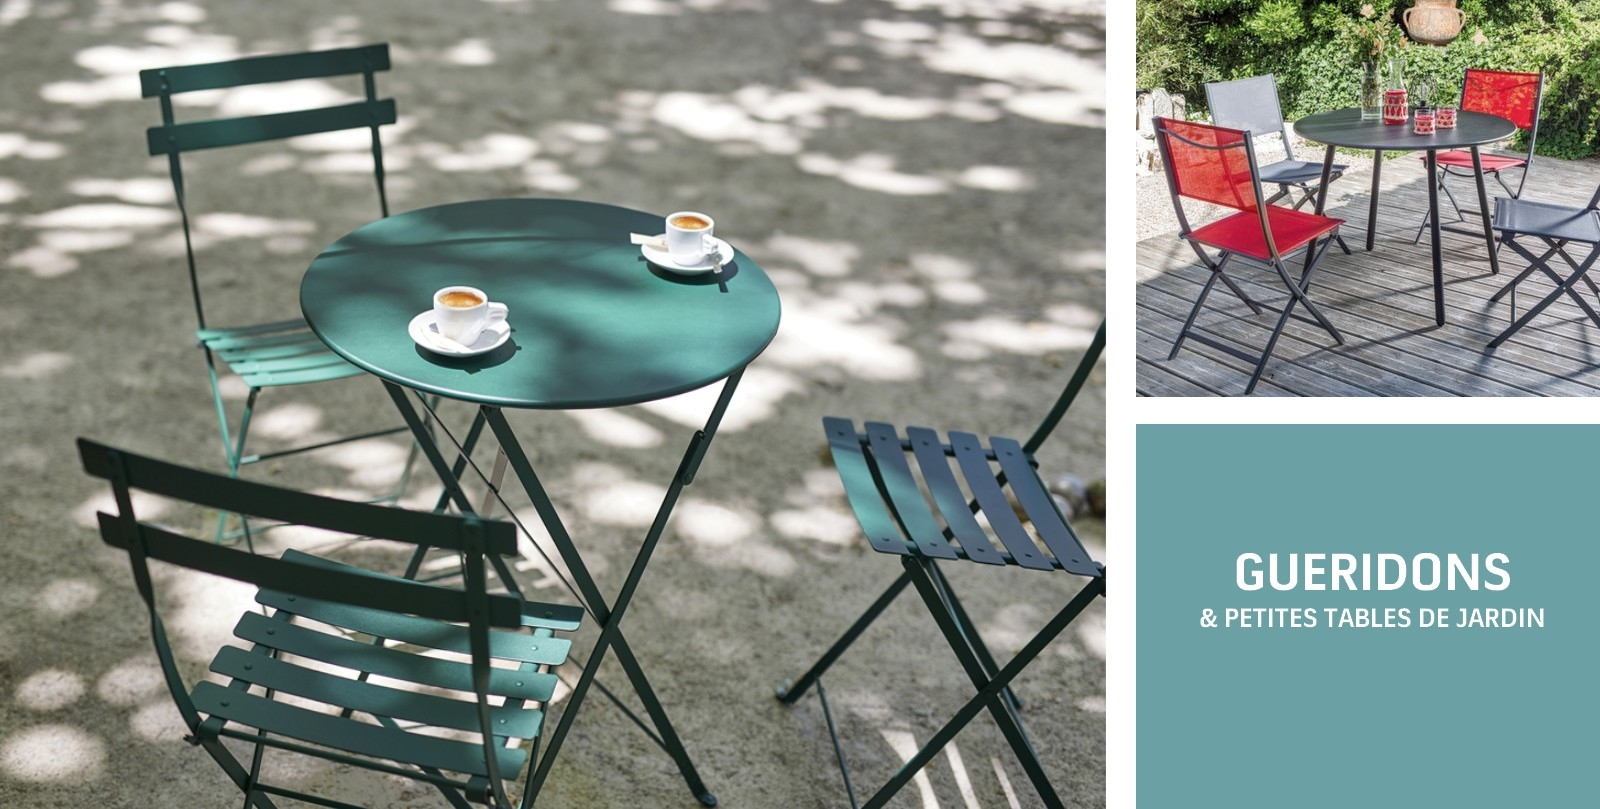 Guéridons & petites tables